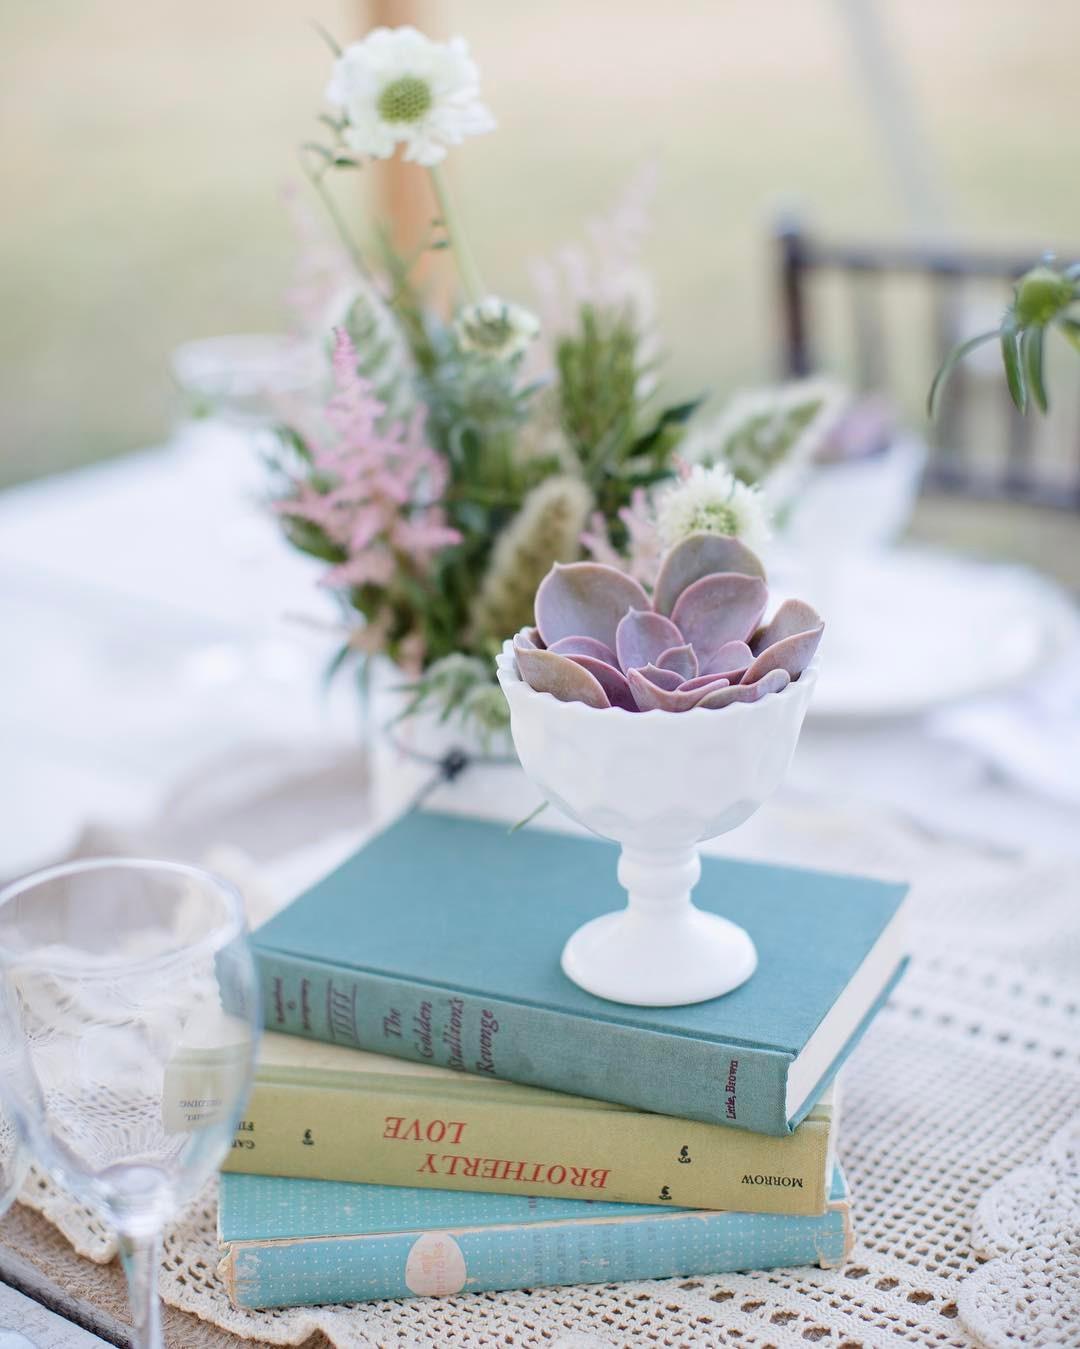 {sweet simplicity} photo | @jharperphoto  #simple #tablescape #vintage #lace #succulents #milkglass #vintagebooks #blush #photoshoot #lotusfloraldesigns #flowerart #weddingflorist